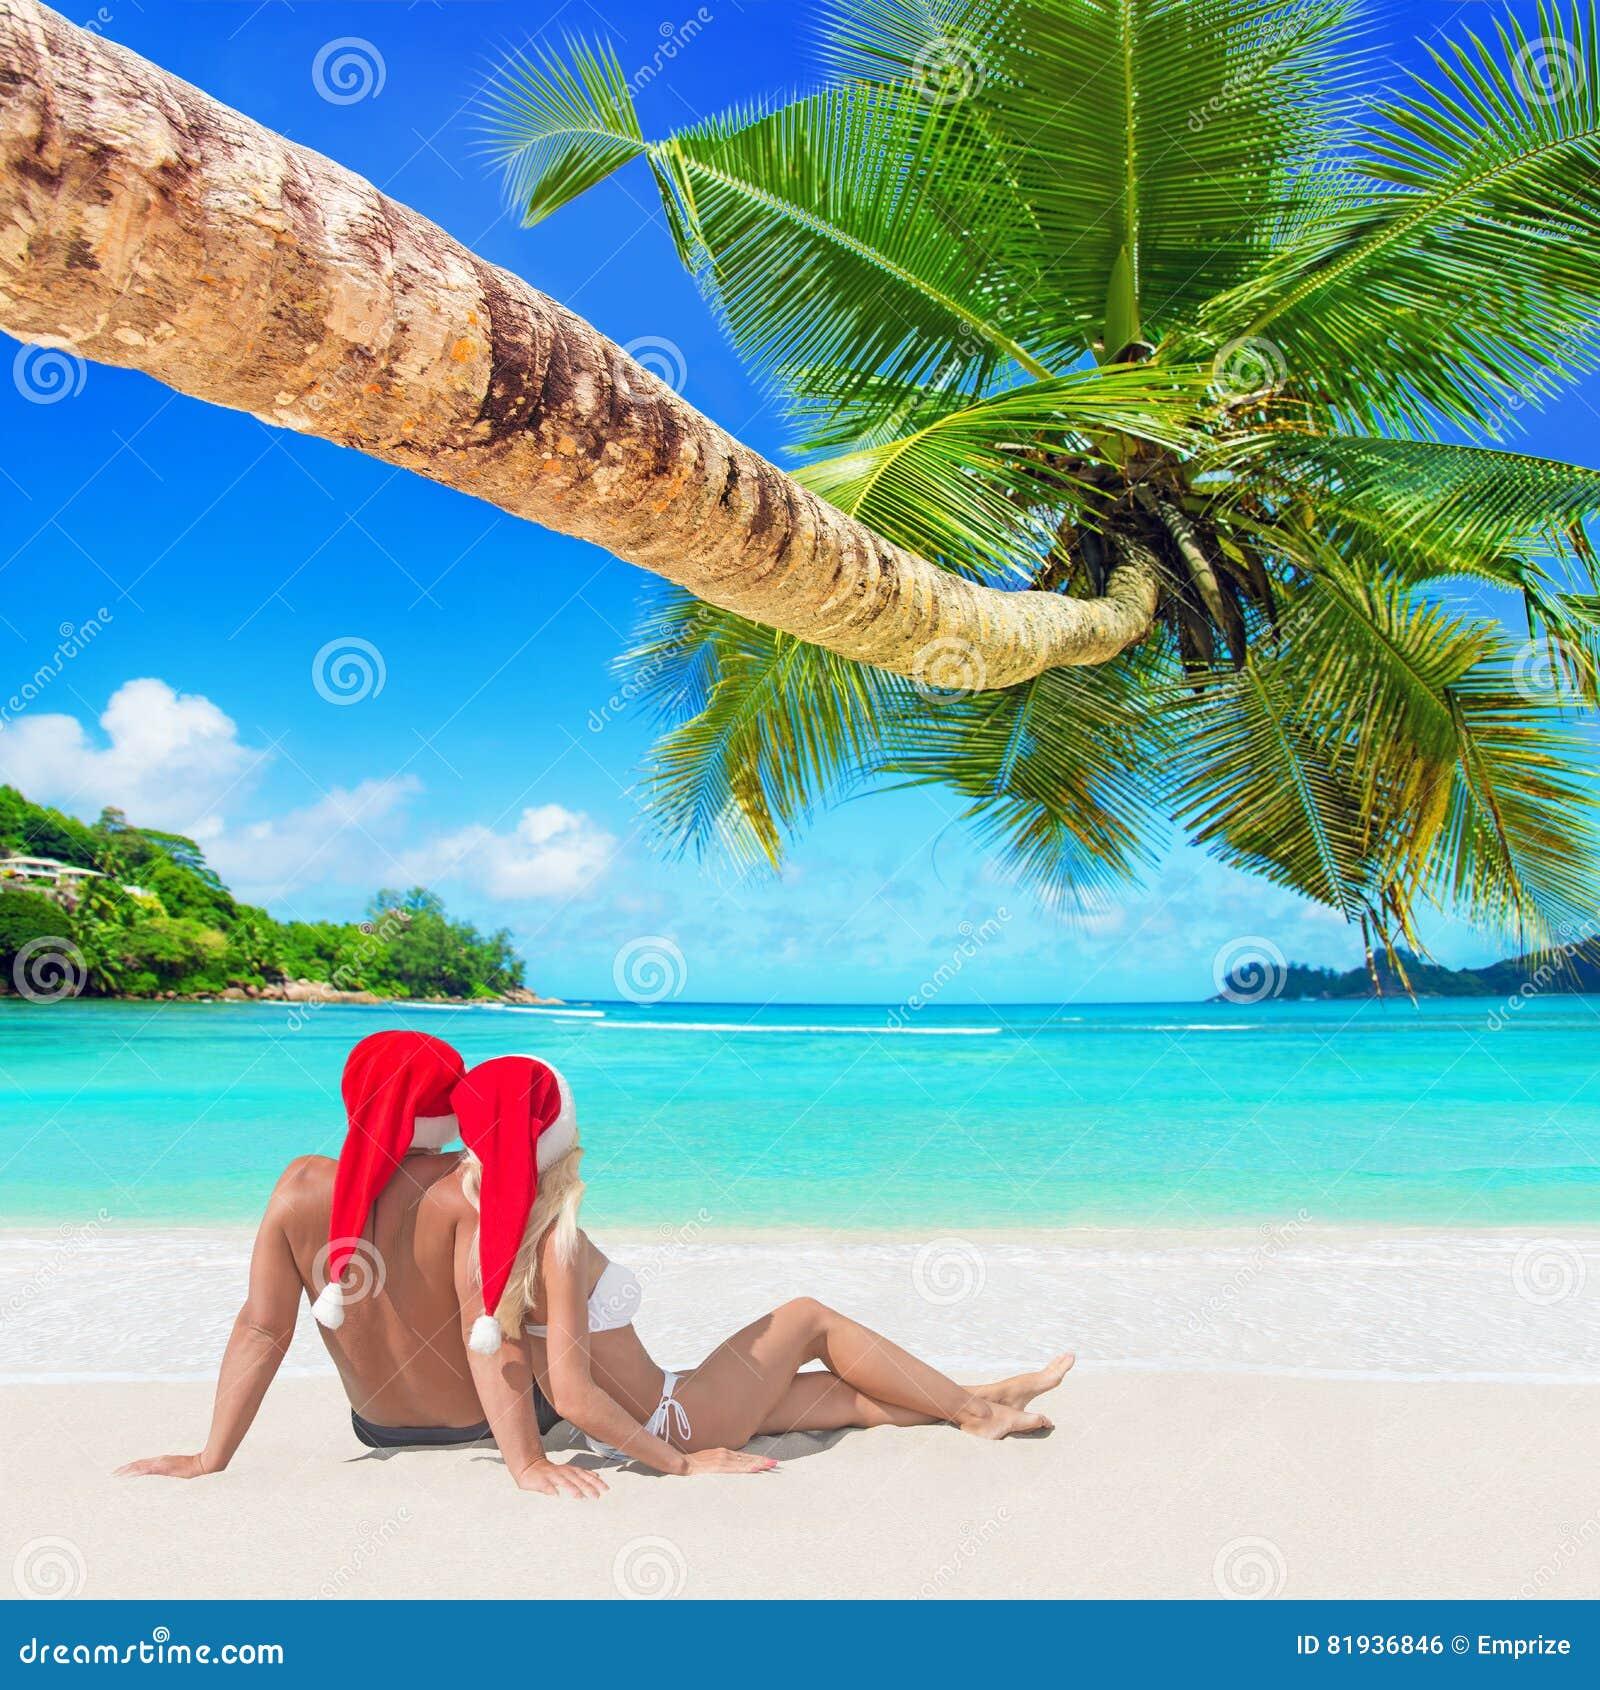 Romantic couple in red Christmas Santa hats sunbathe at tropical palm sandy island beach